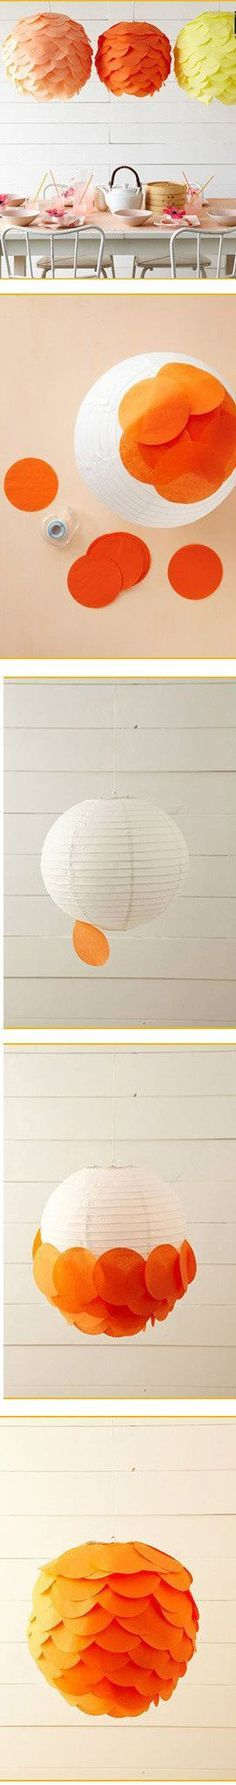 Diy Paper Lanterns – Lets make it colorful....15 Creative Diy Paper Lanterns Ideas to Brighten Your Home #diyCraft